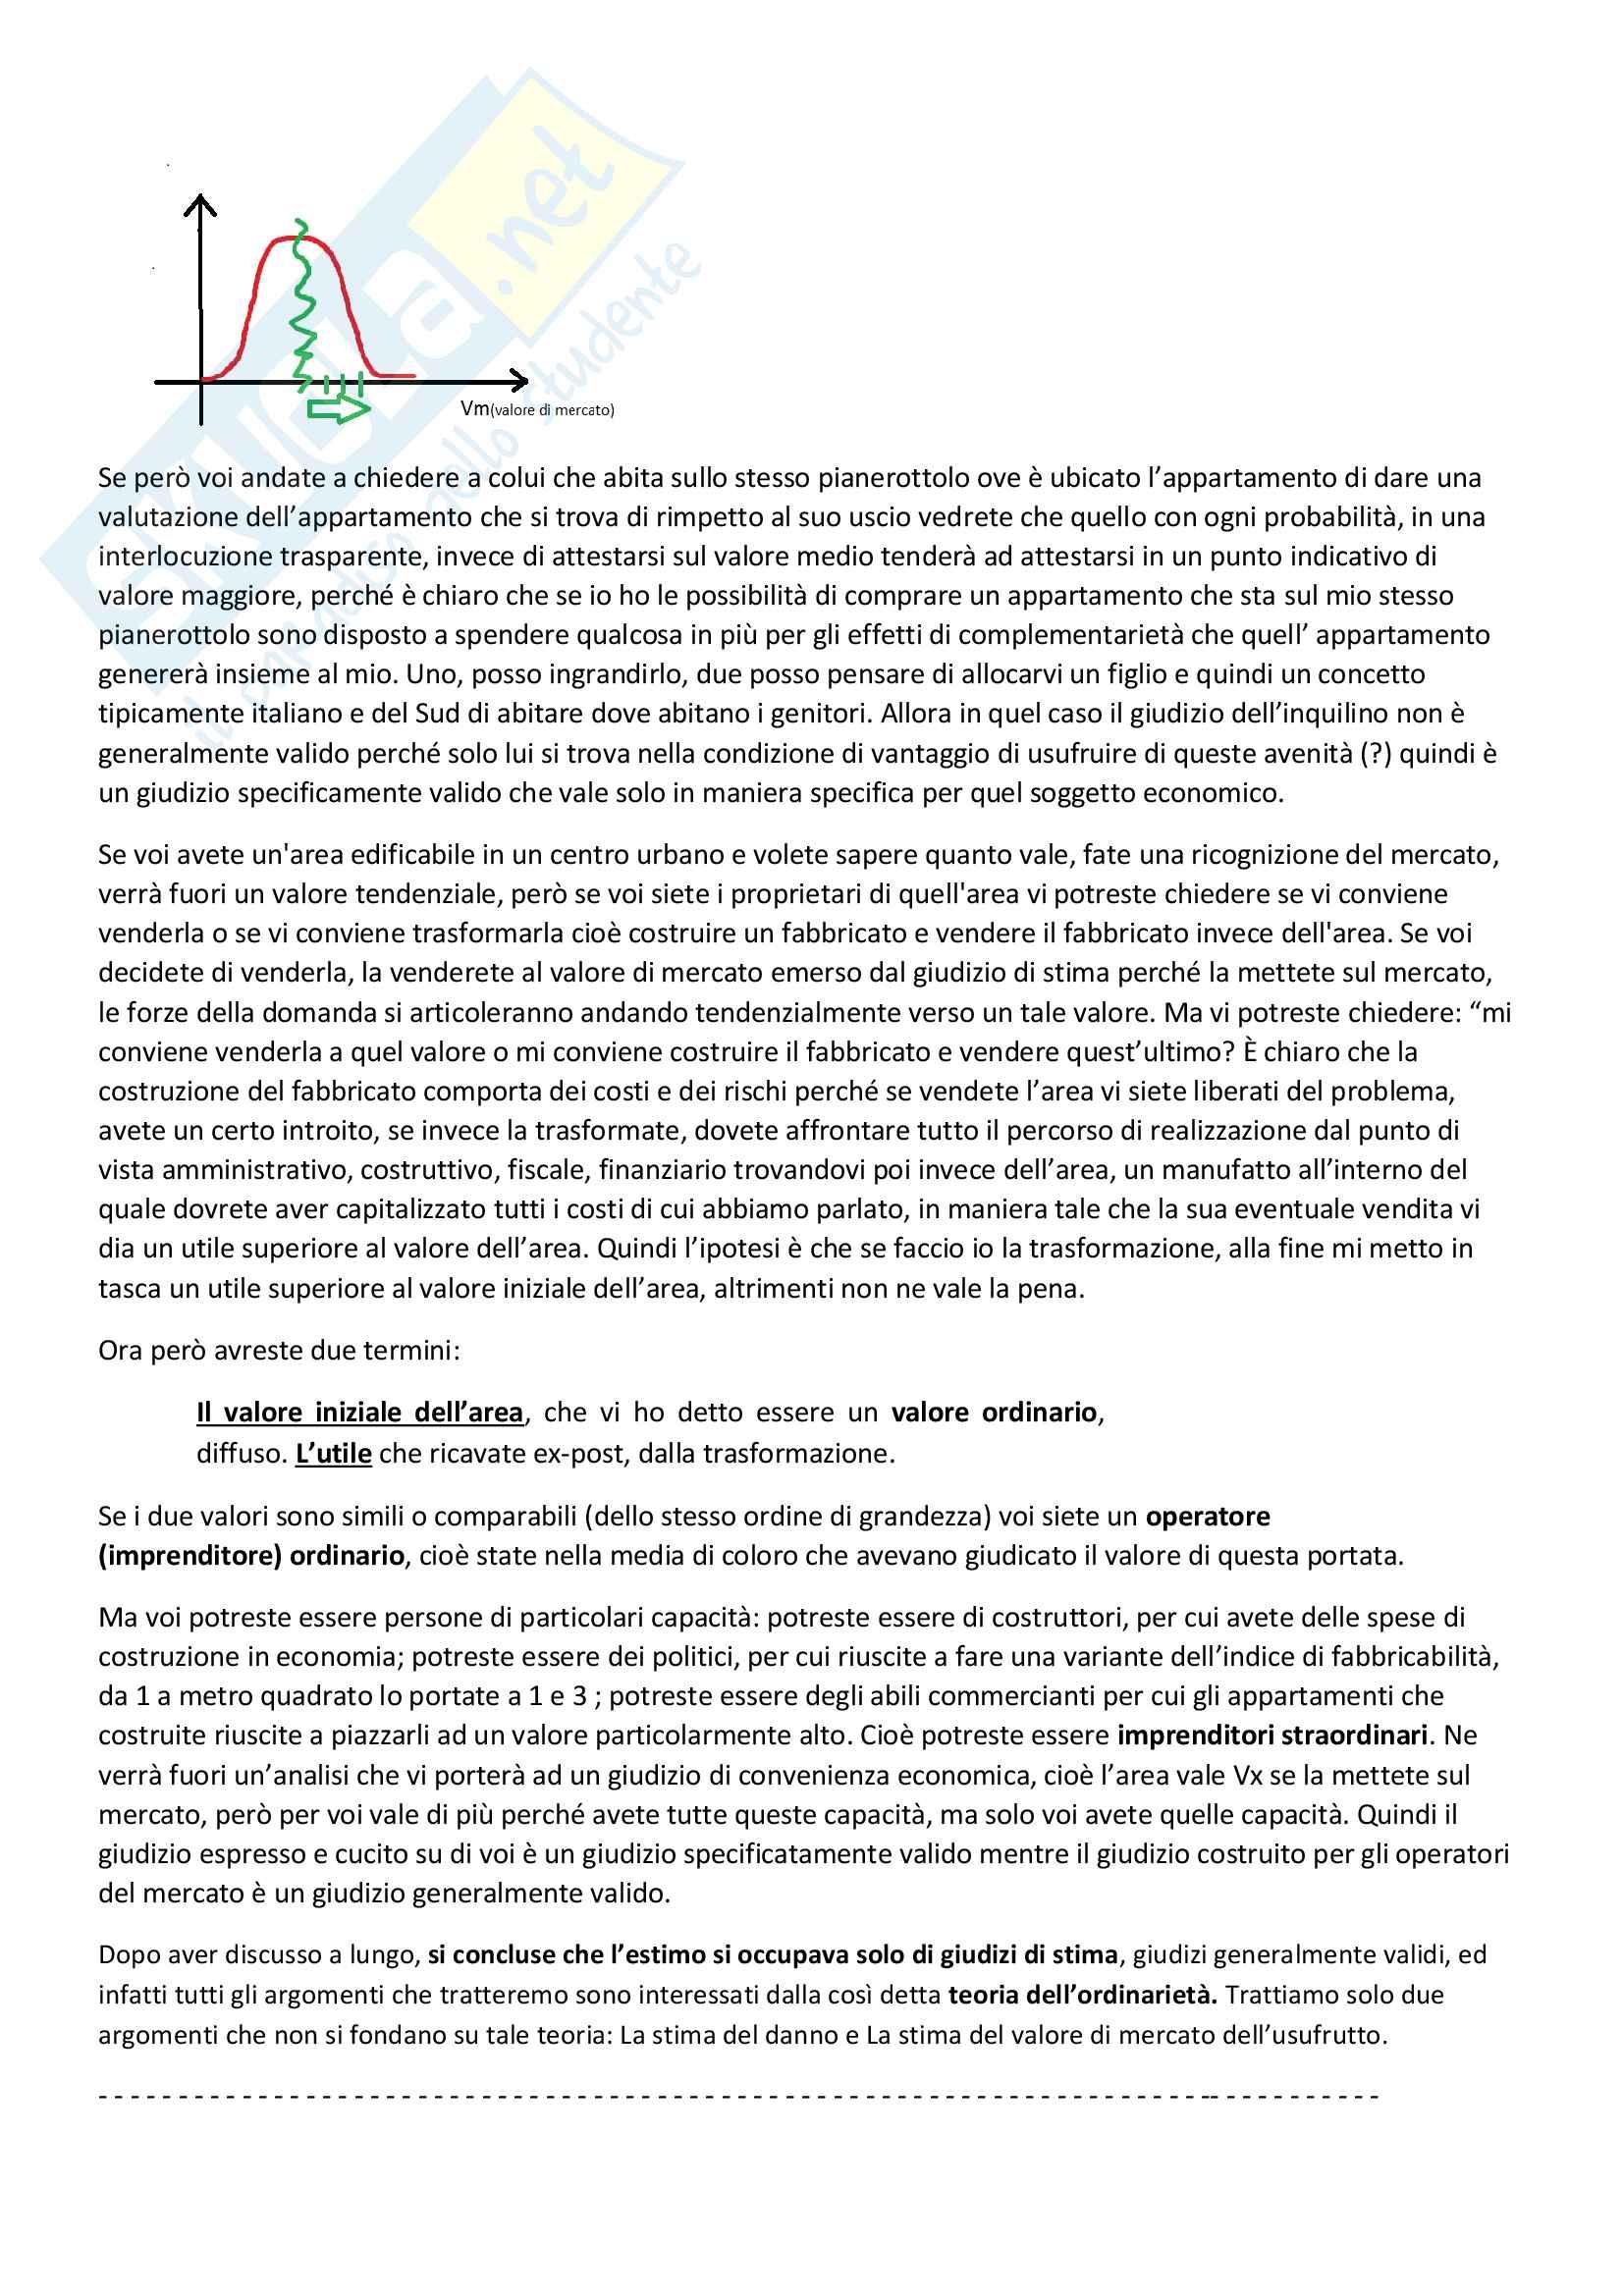 Economia ed Estimo (Estimo) Pag. 2